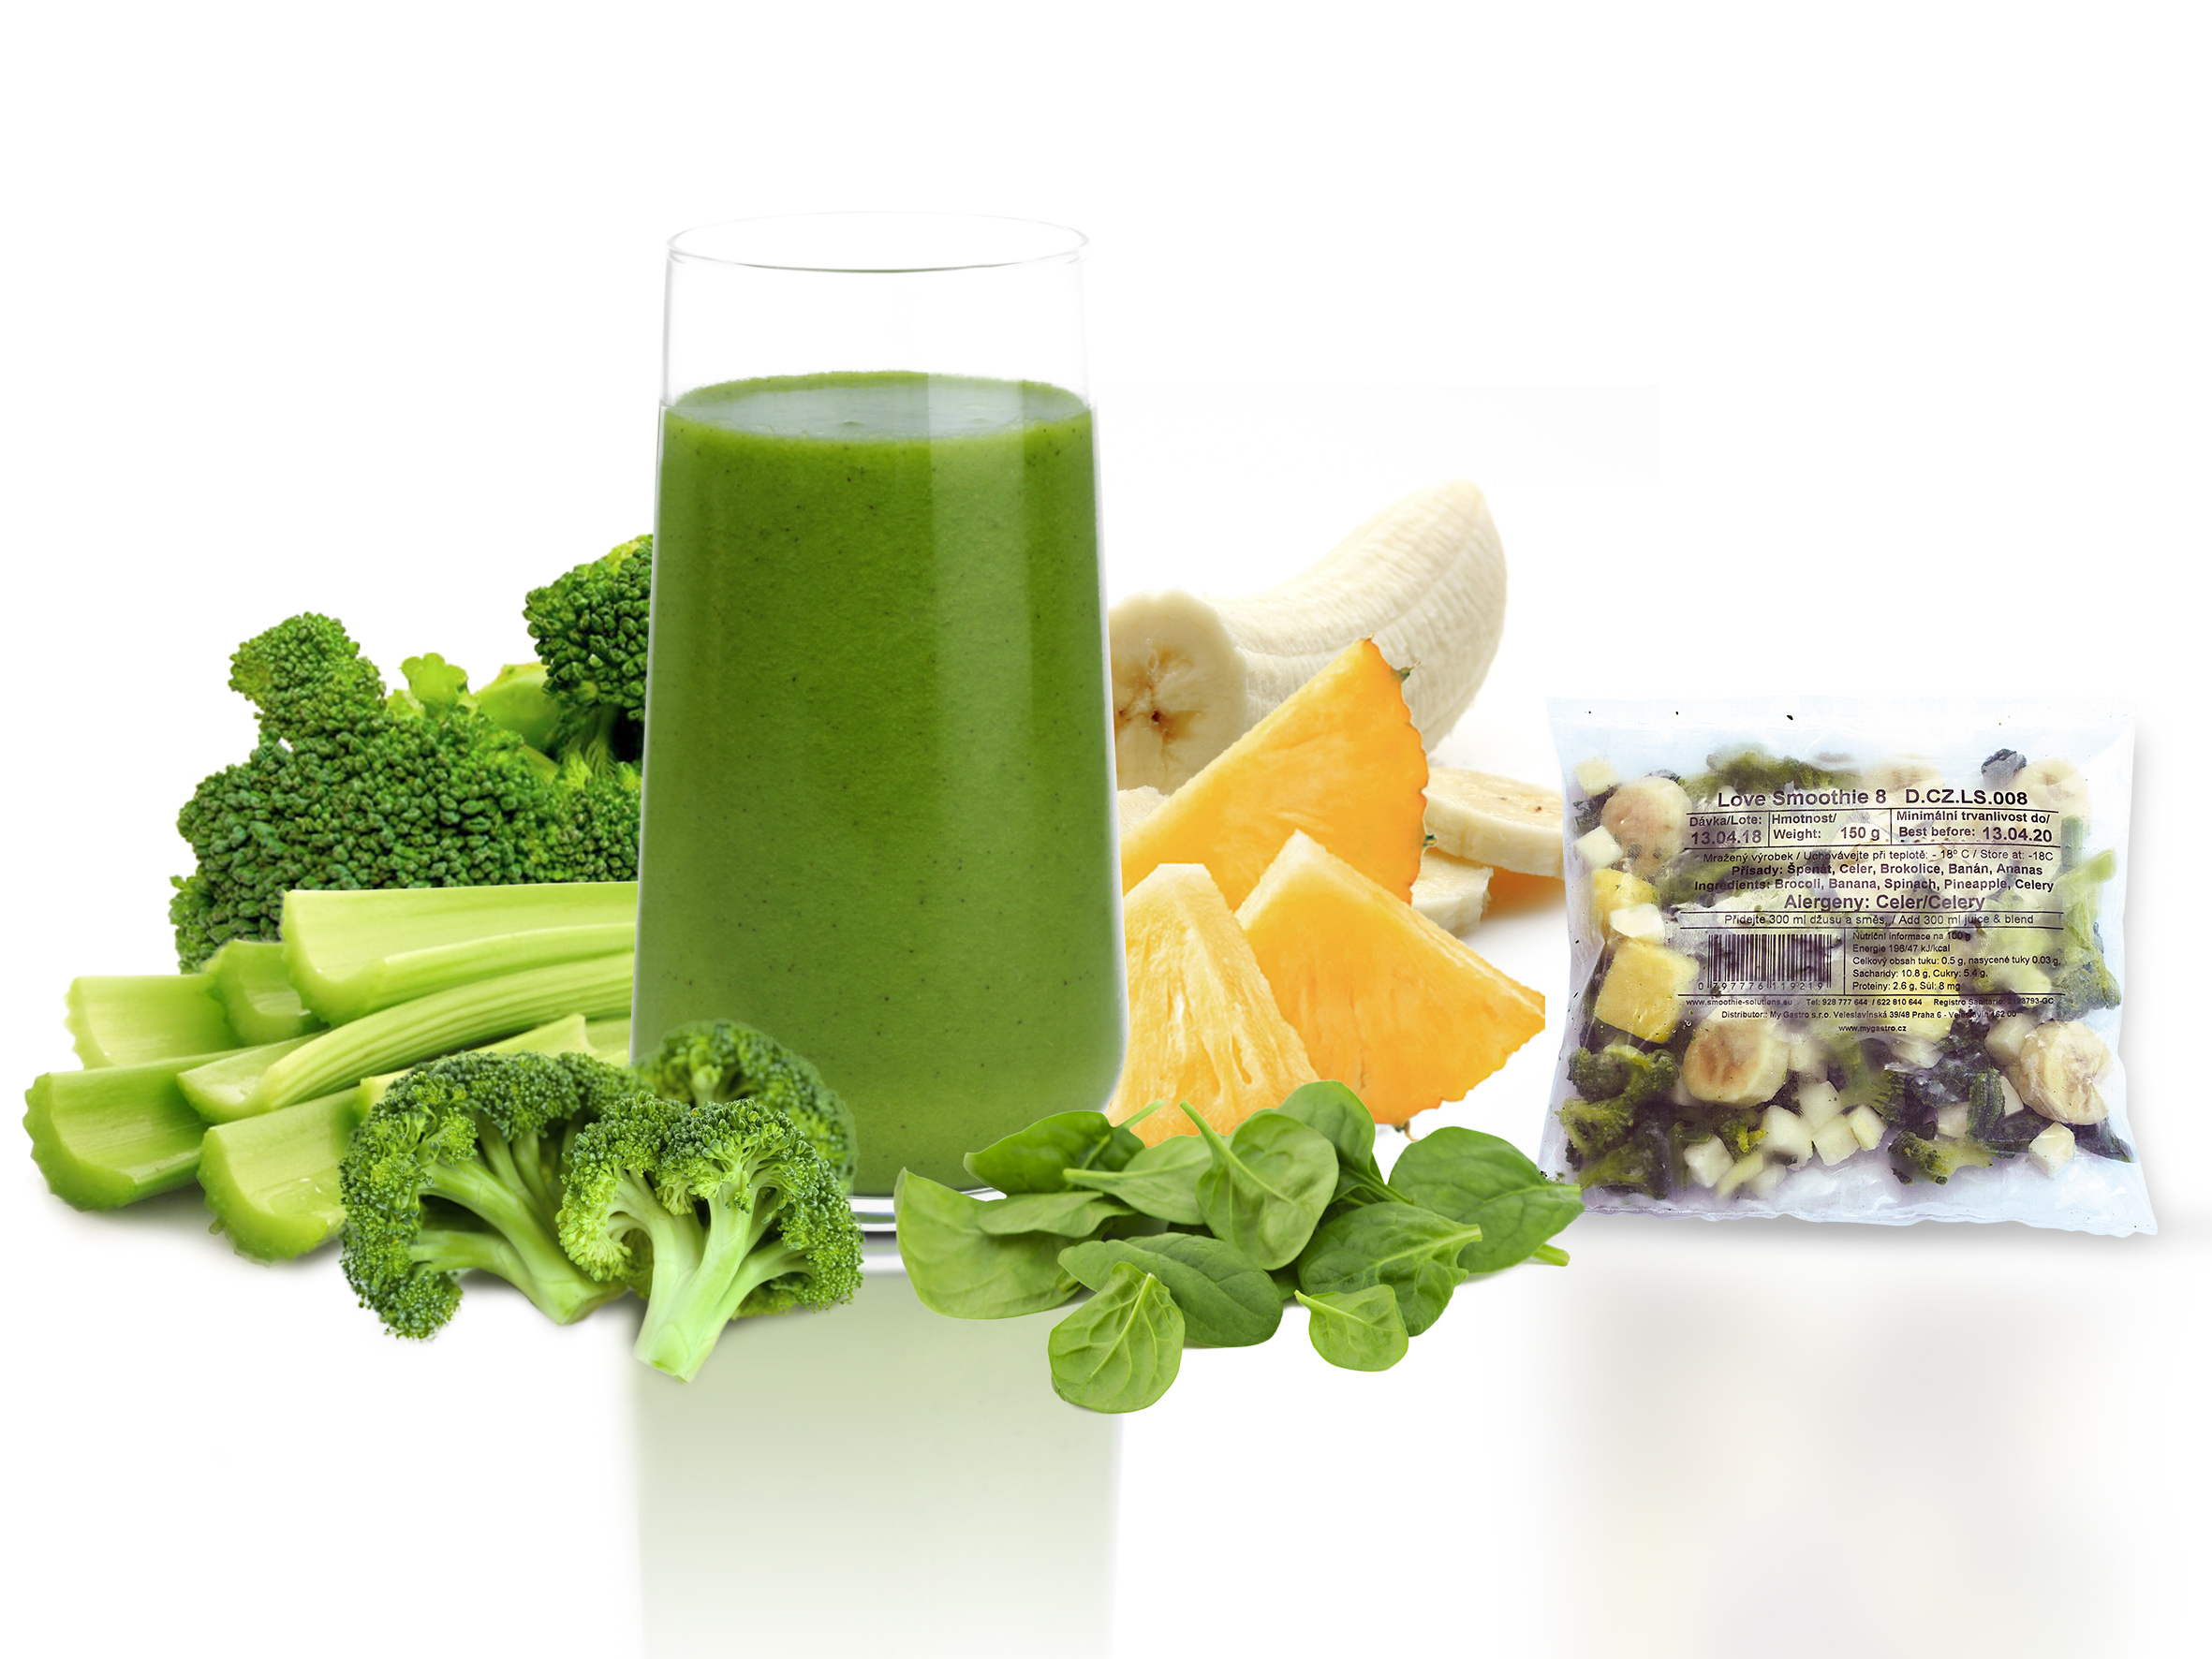 Smoothies 8 - brokolice, ananas, špenát, banán, řap. celer